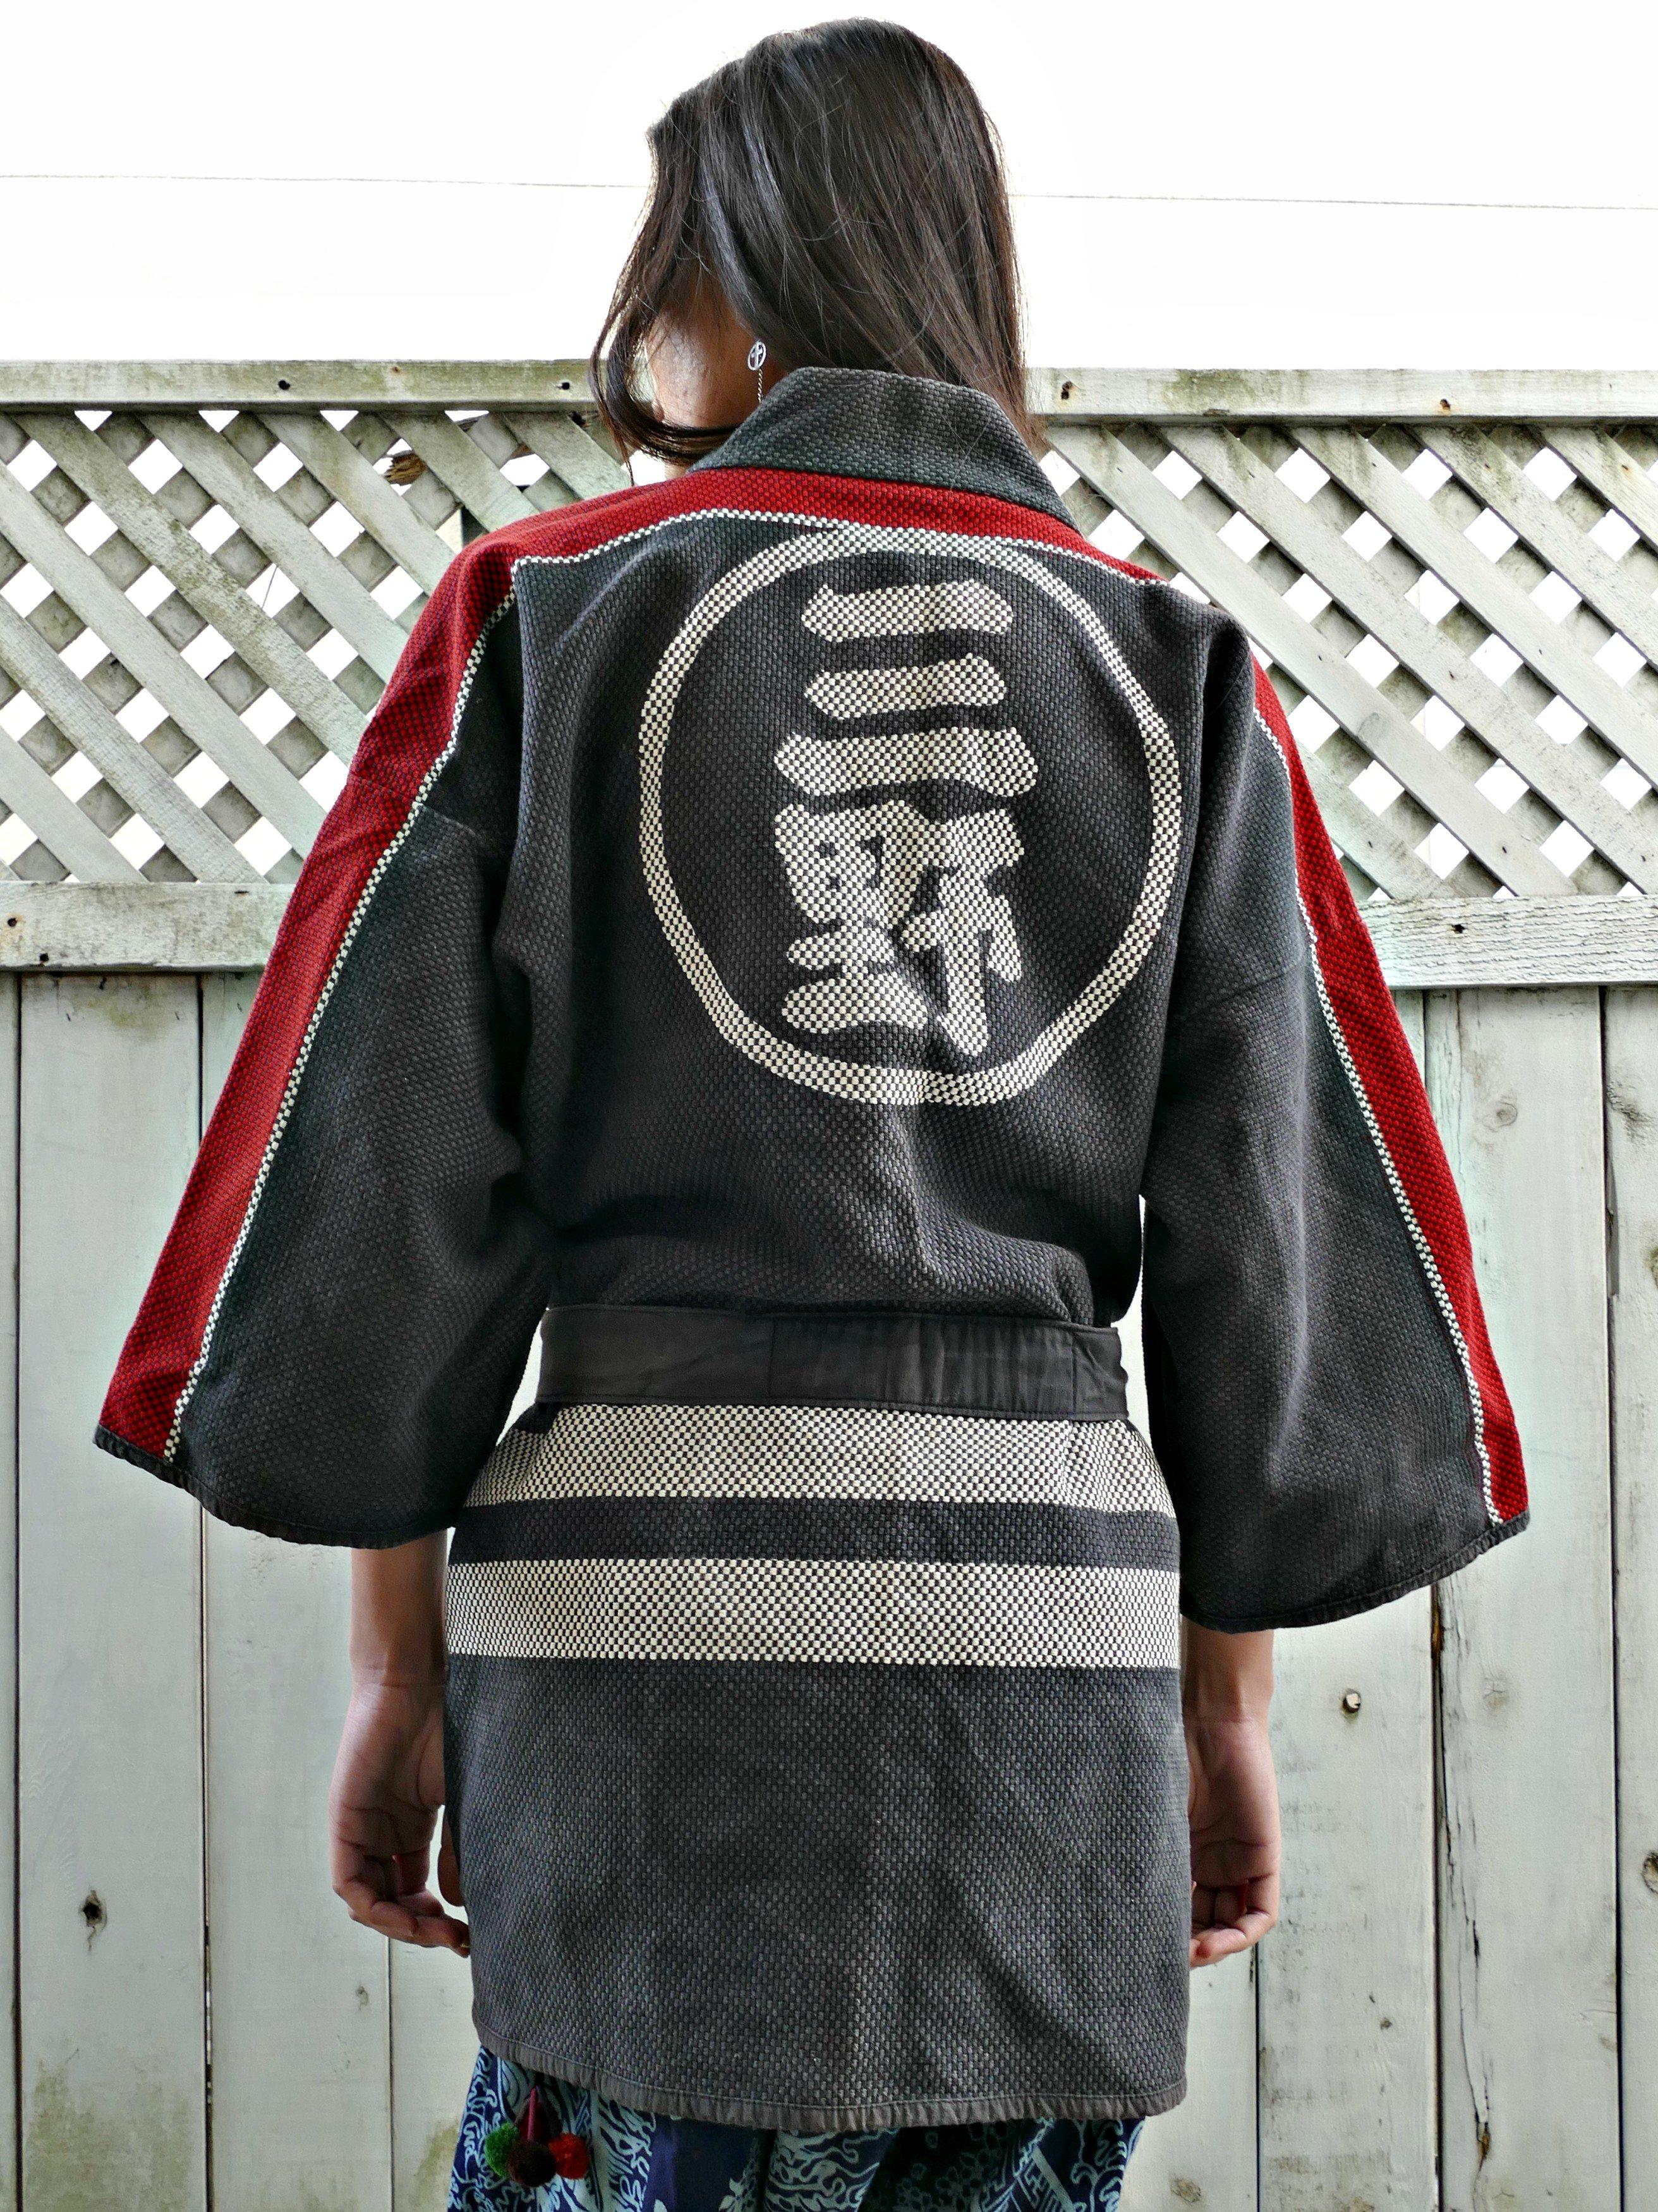 Post1950 Vintage Japanese Fireman Hanten Kimono Jacket